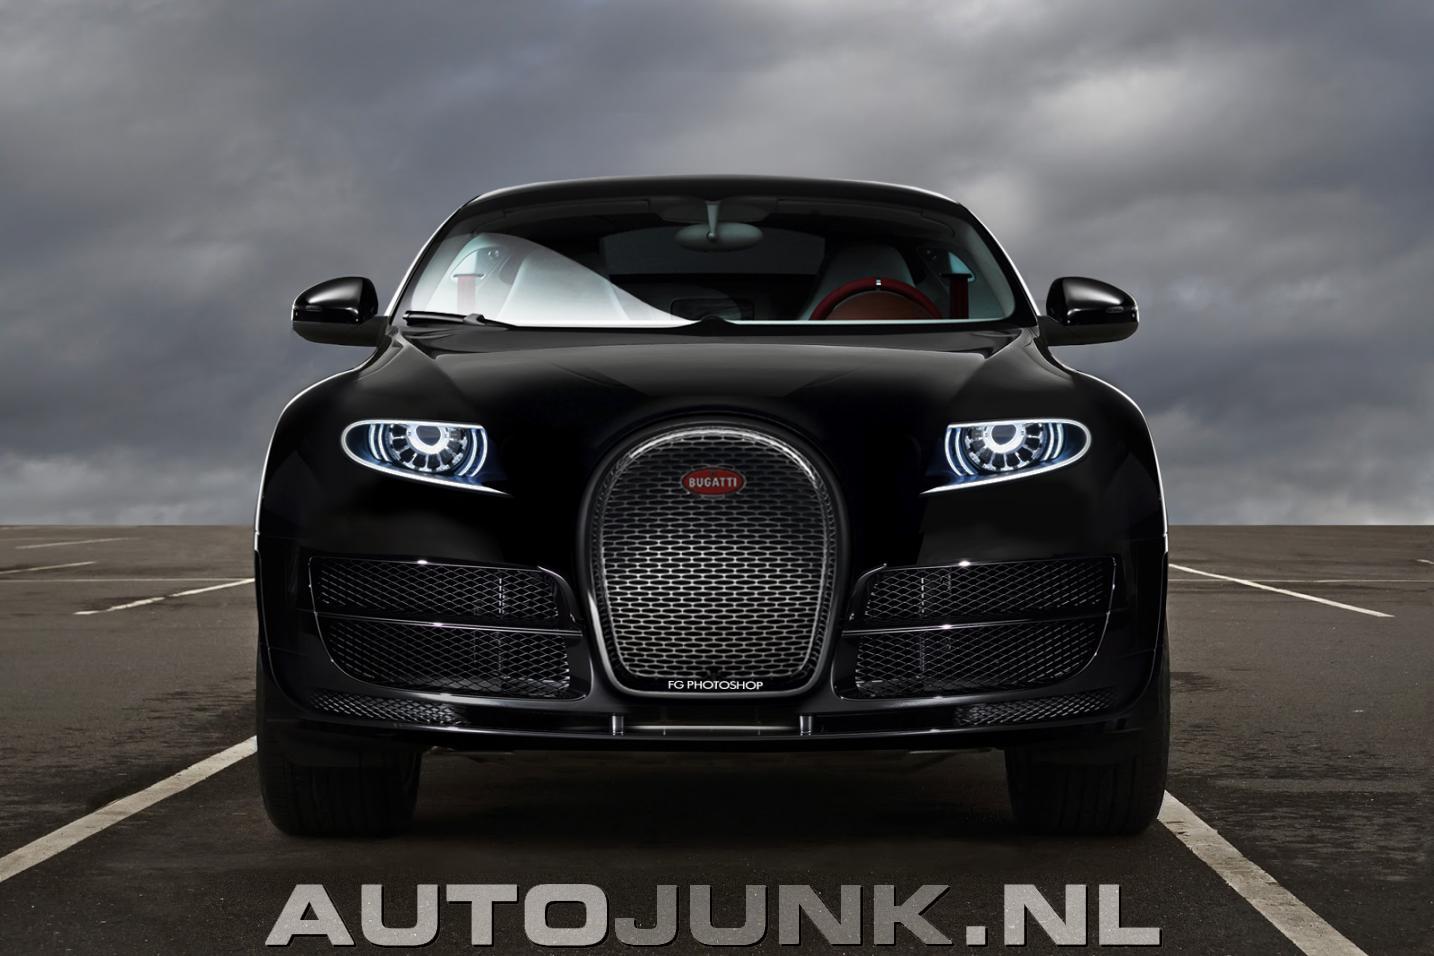 Review de visions autos futur bentley suv et bugatti suv 2013 224 2015